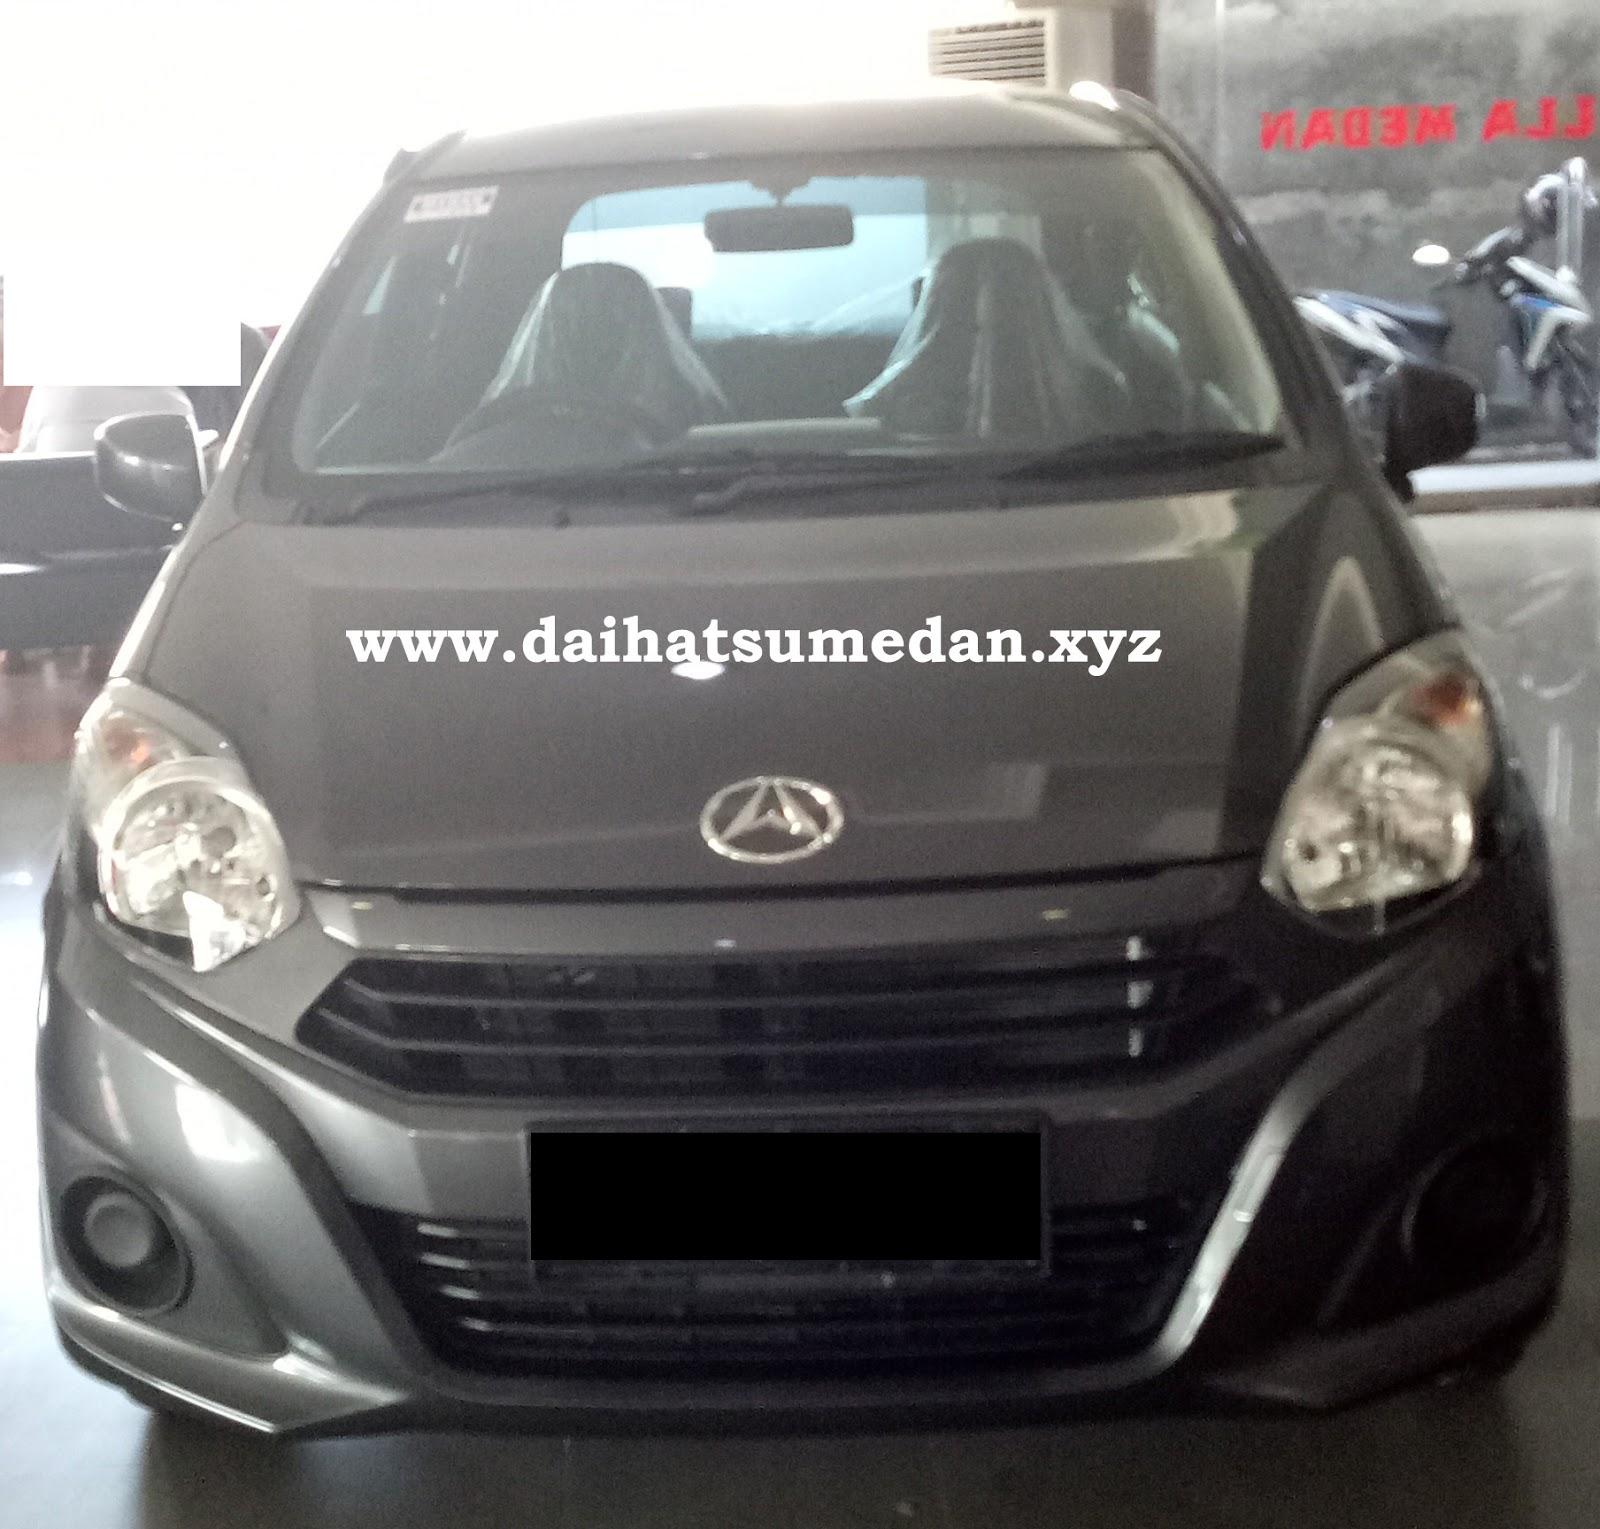 Daihatsu New Ayla 1.0 M